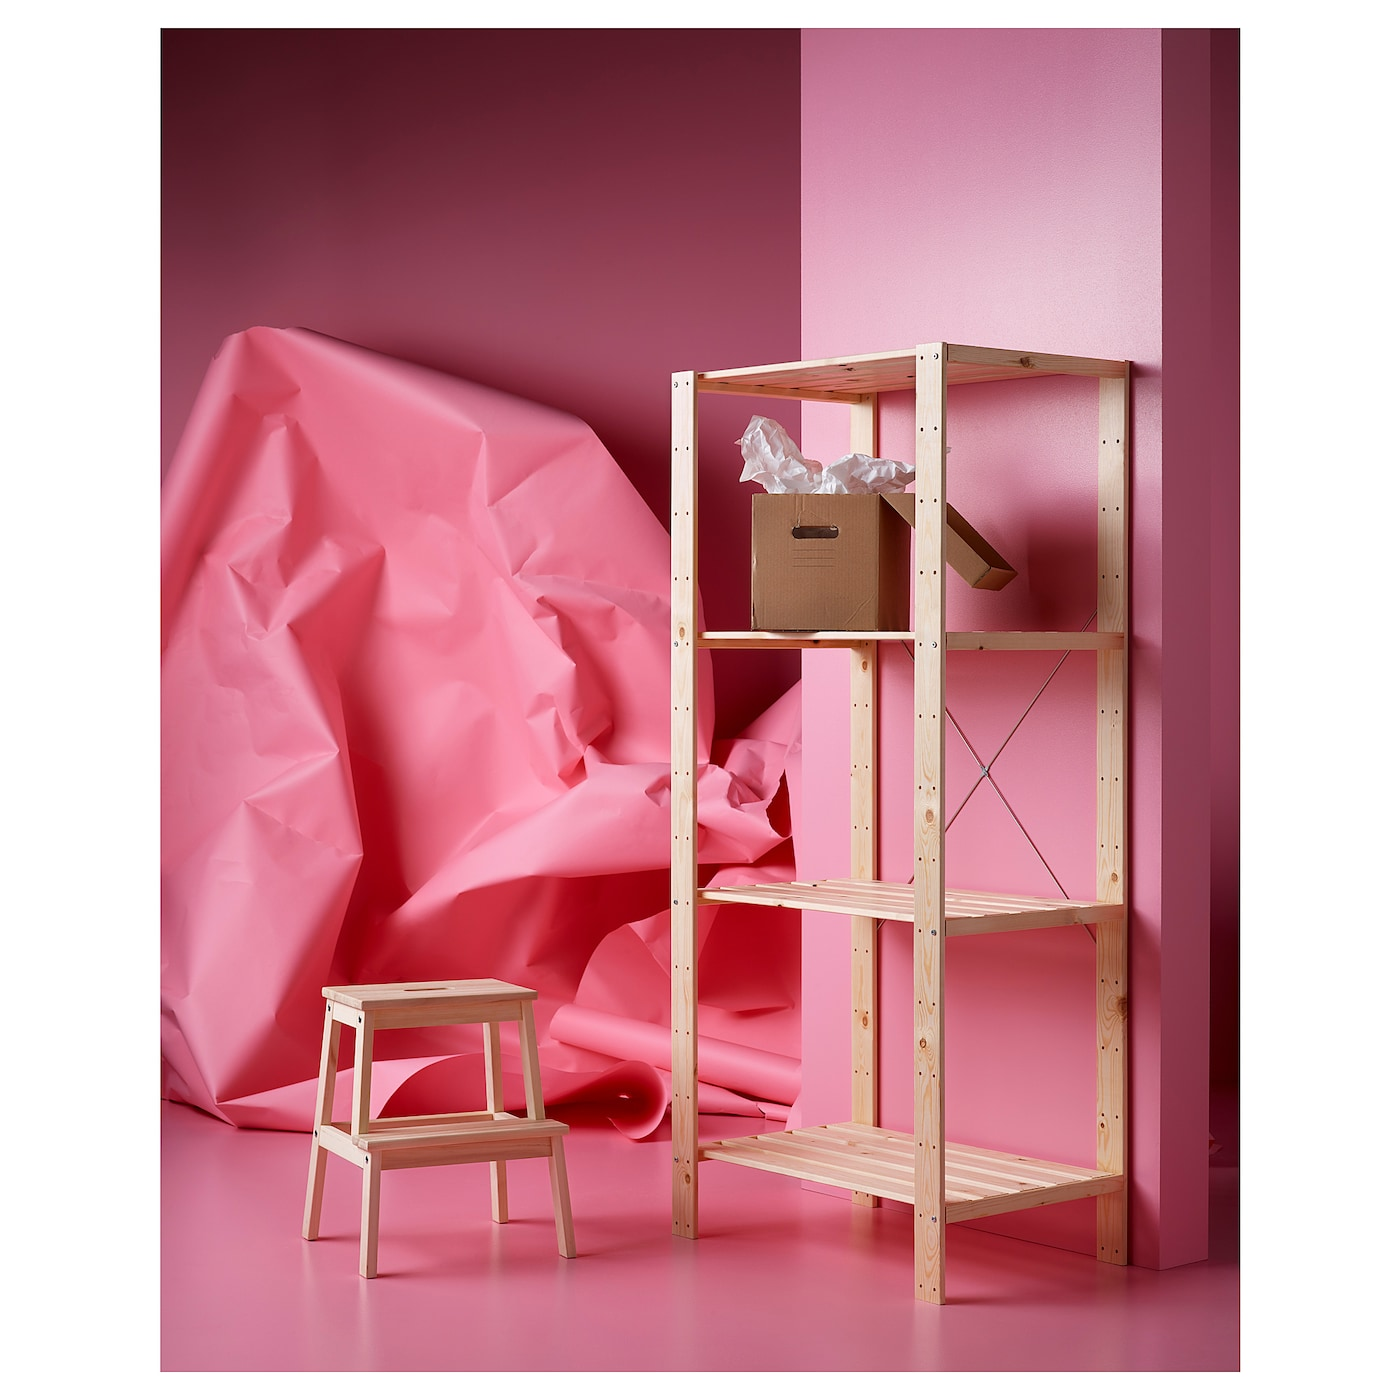 "HEJNE Shelf unit, softwood, 30 3/4x19 5/8x67 3/8 """